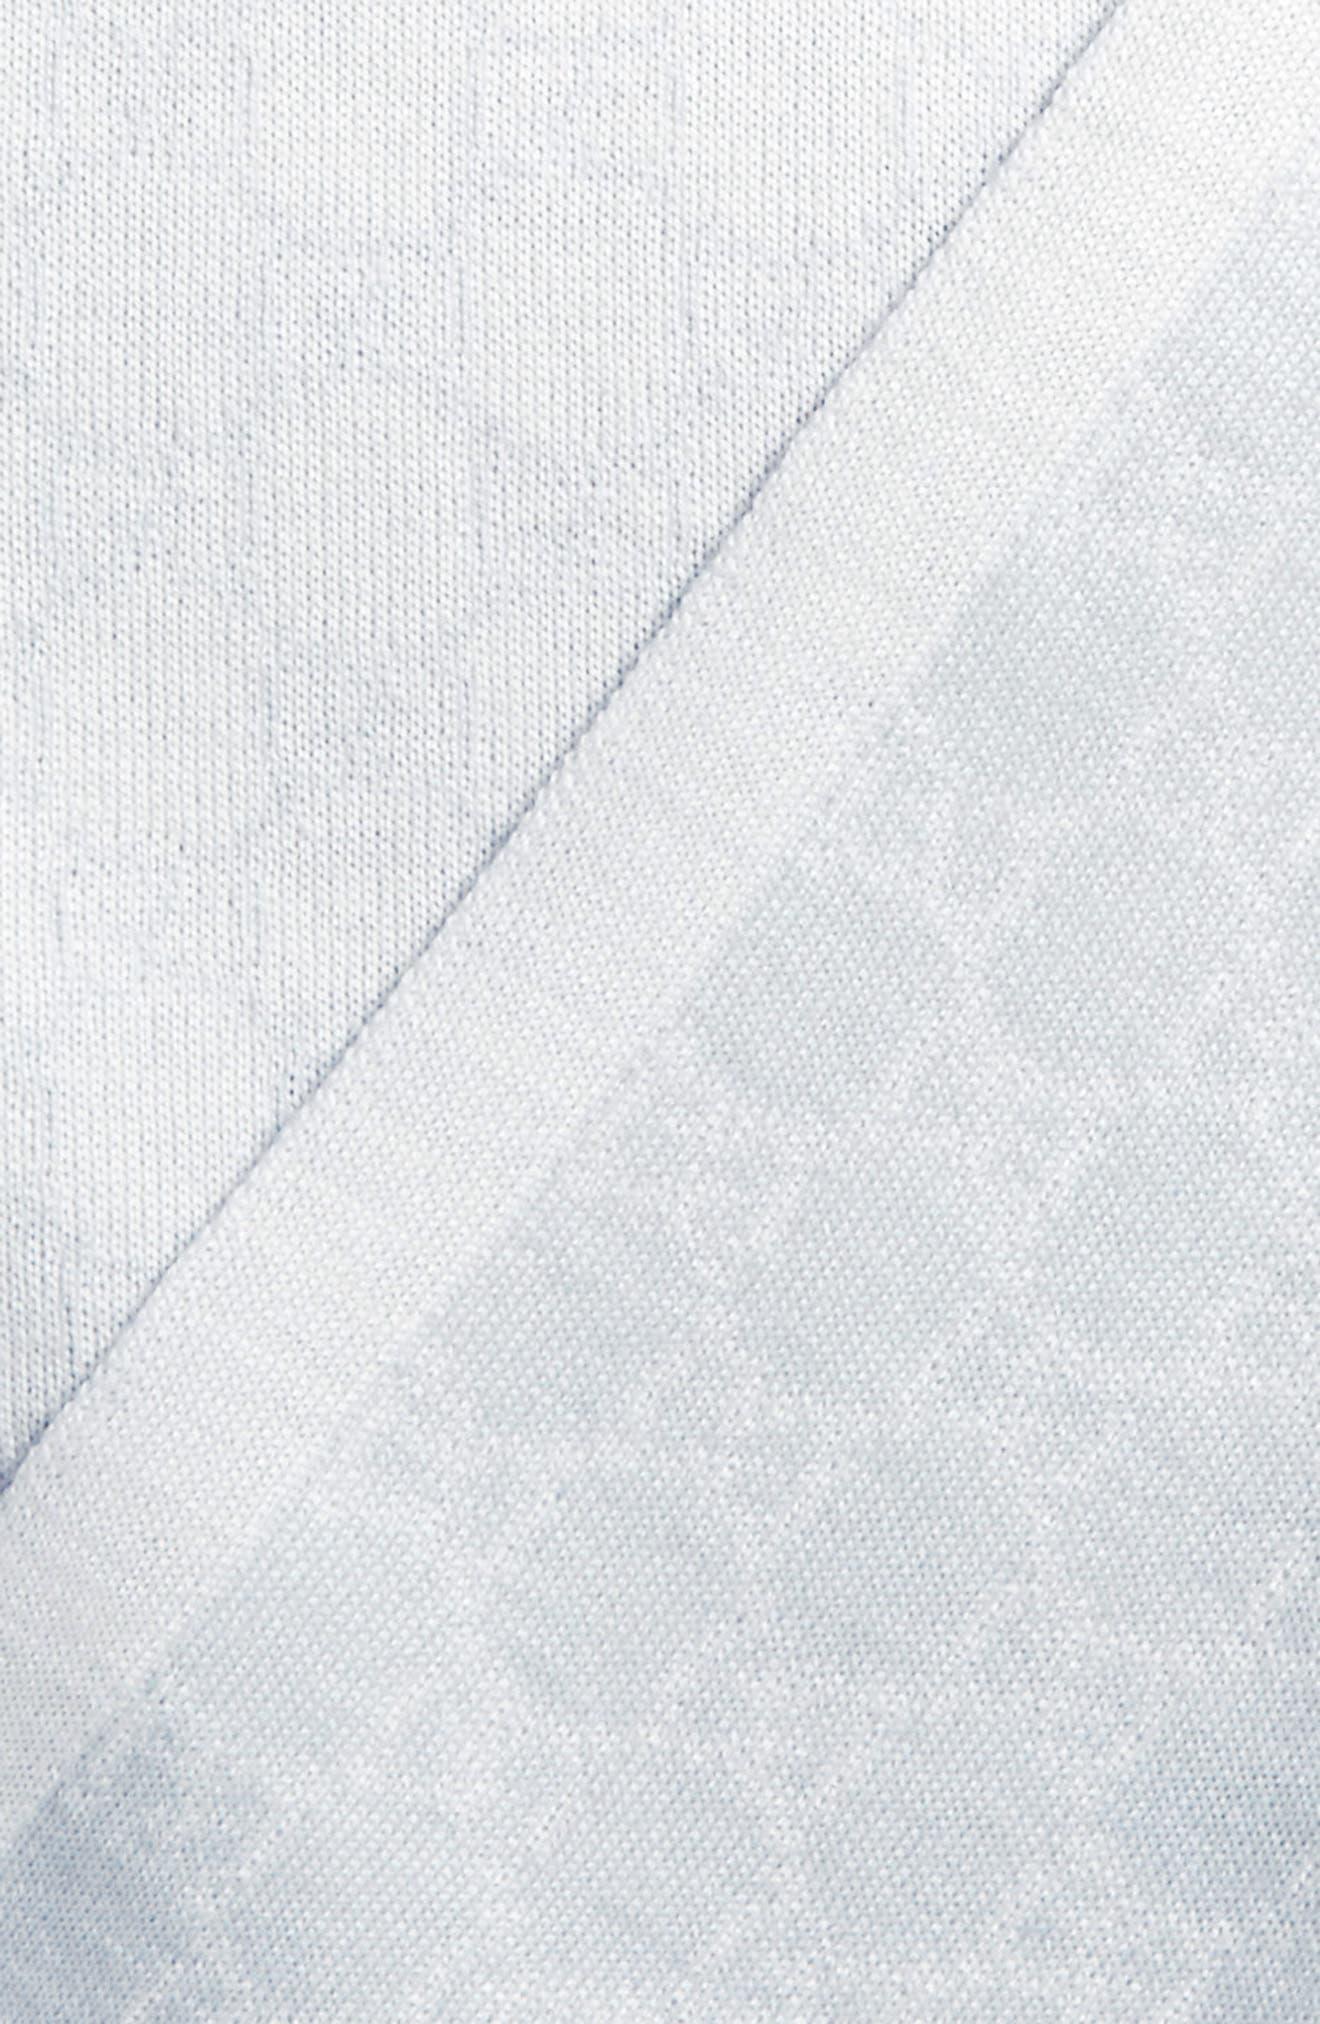 Wool Baby Blanket,                             Alternate thumbnail 2, color,                             IVORY/ SKY BLUE